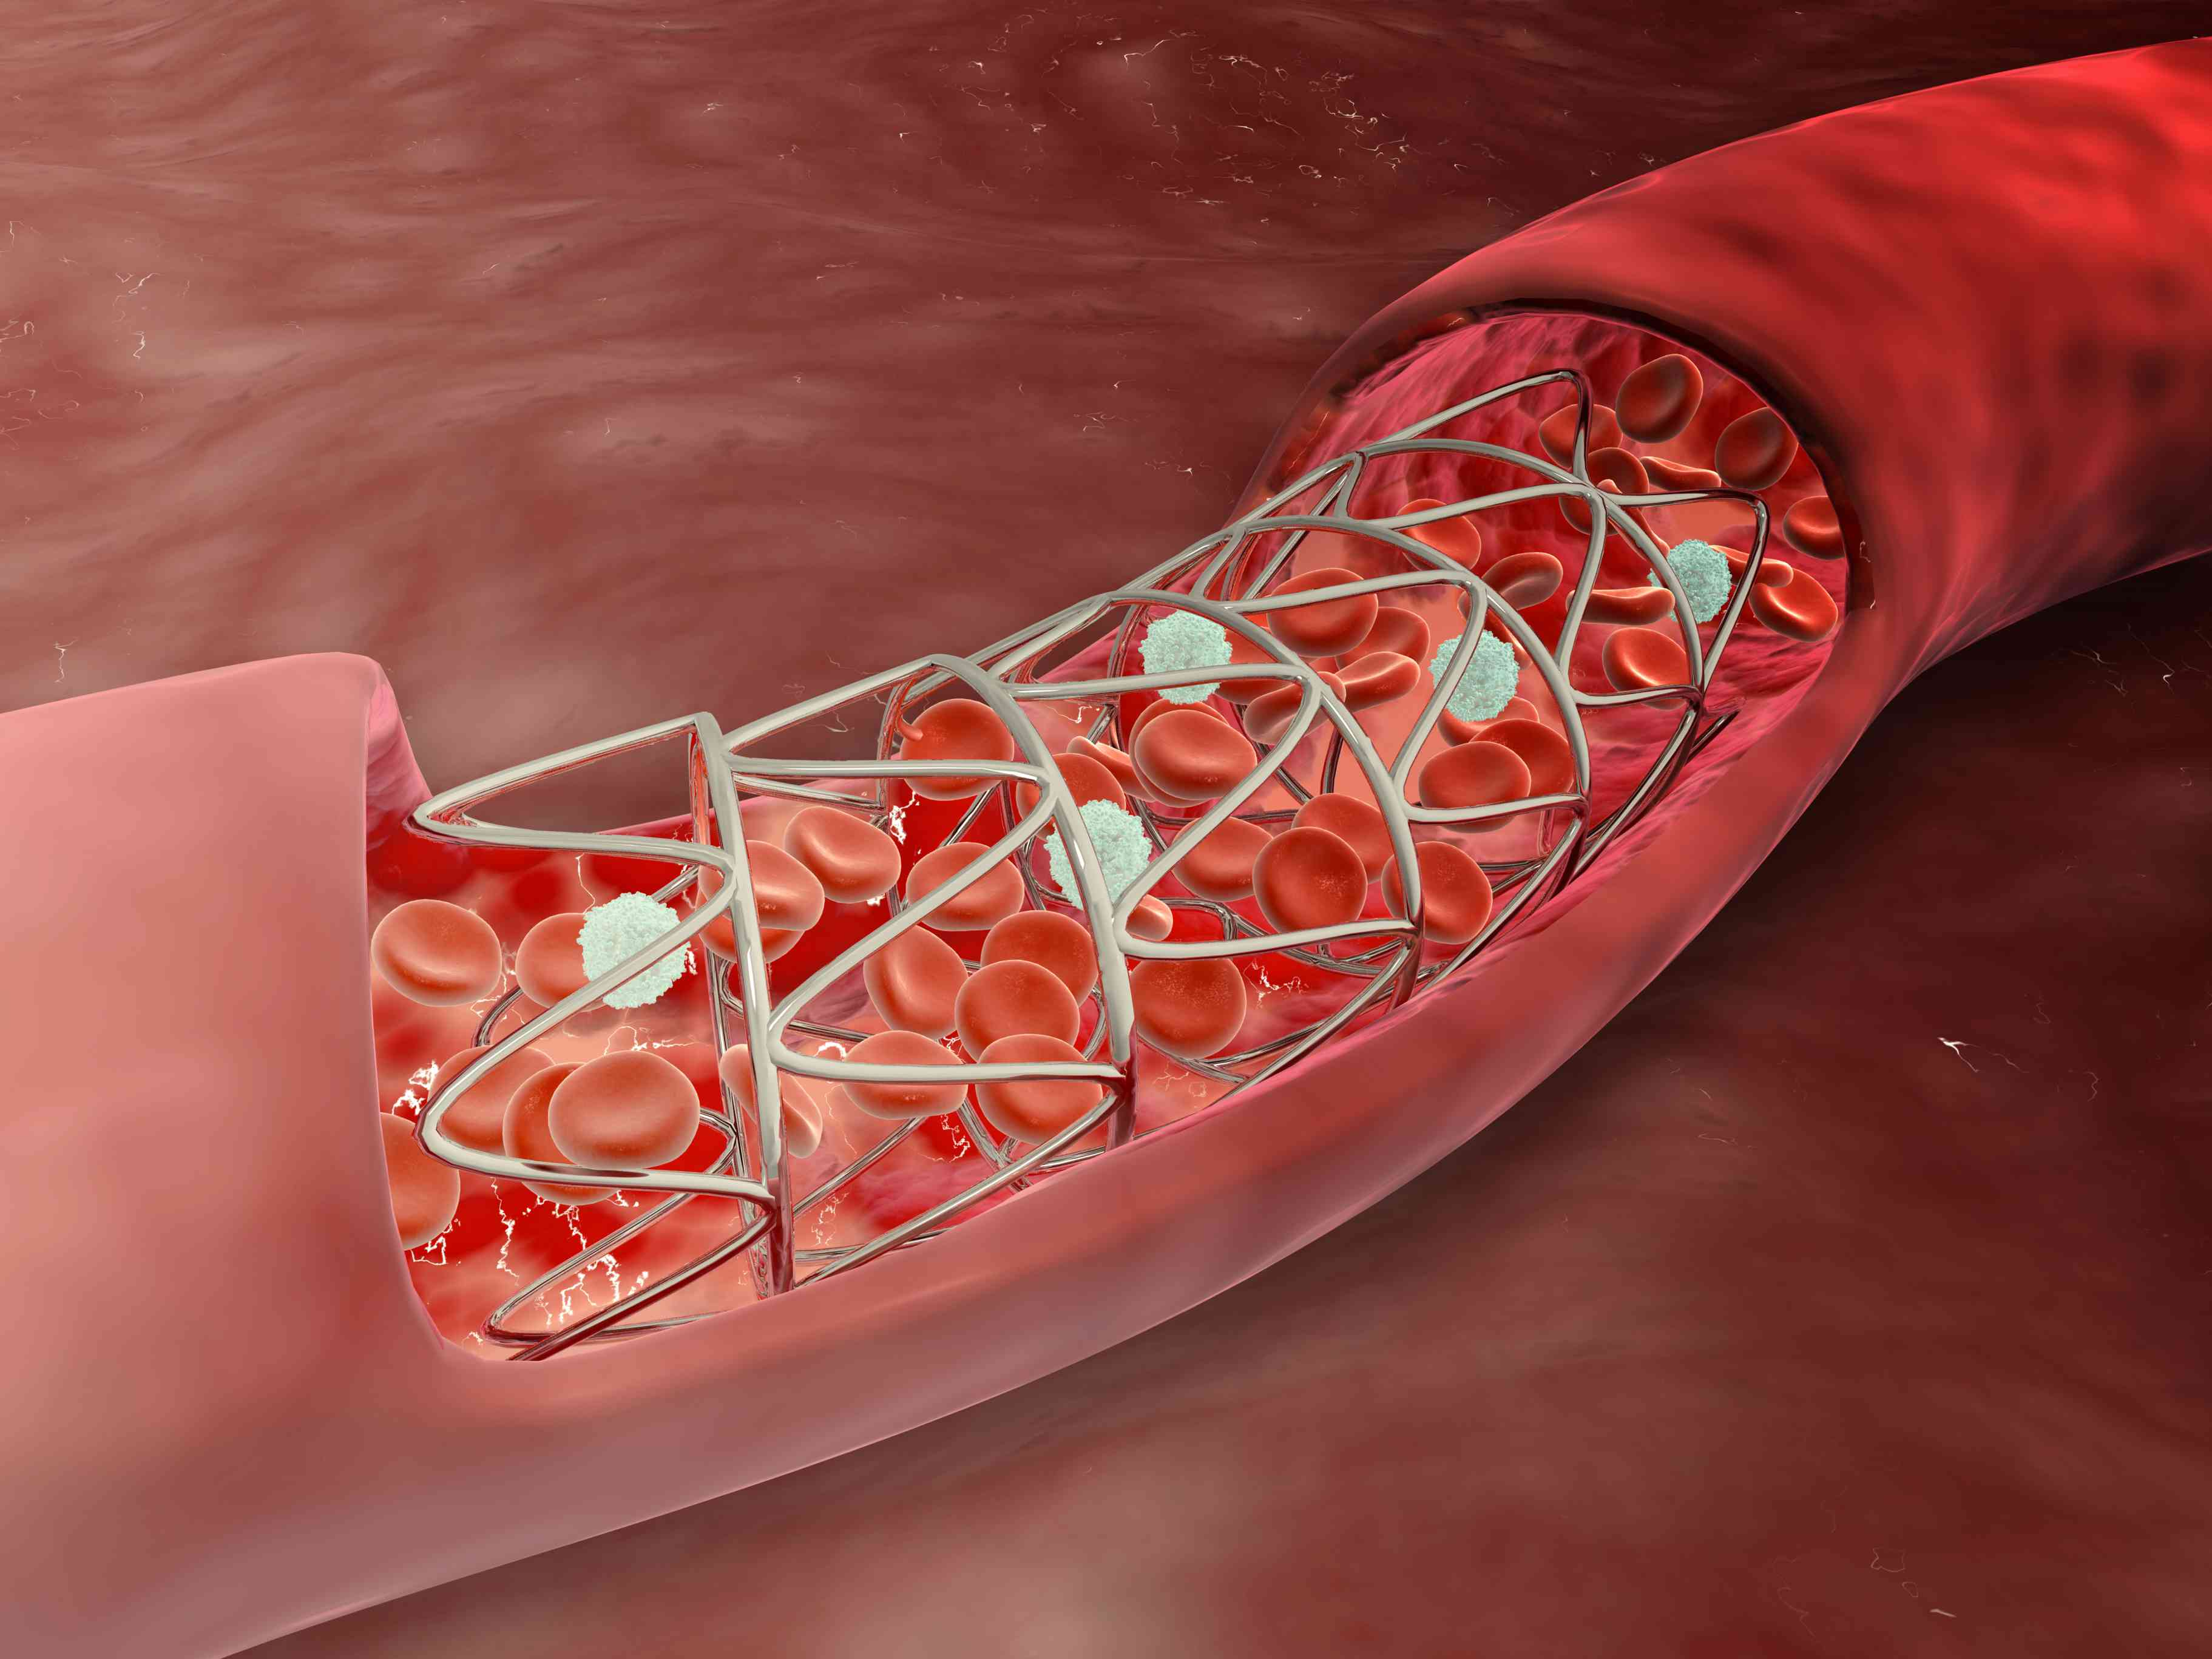 A stent in a coronary artery